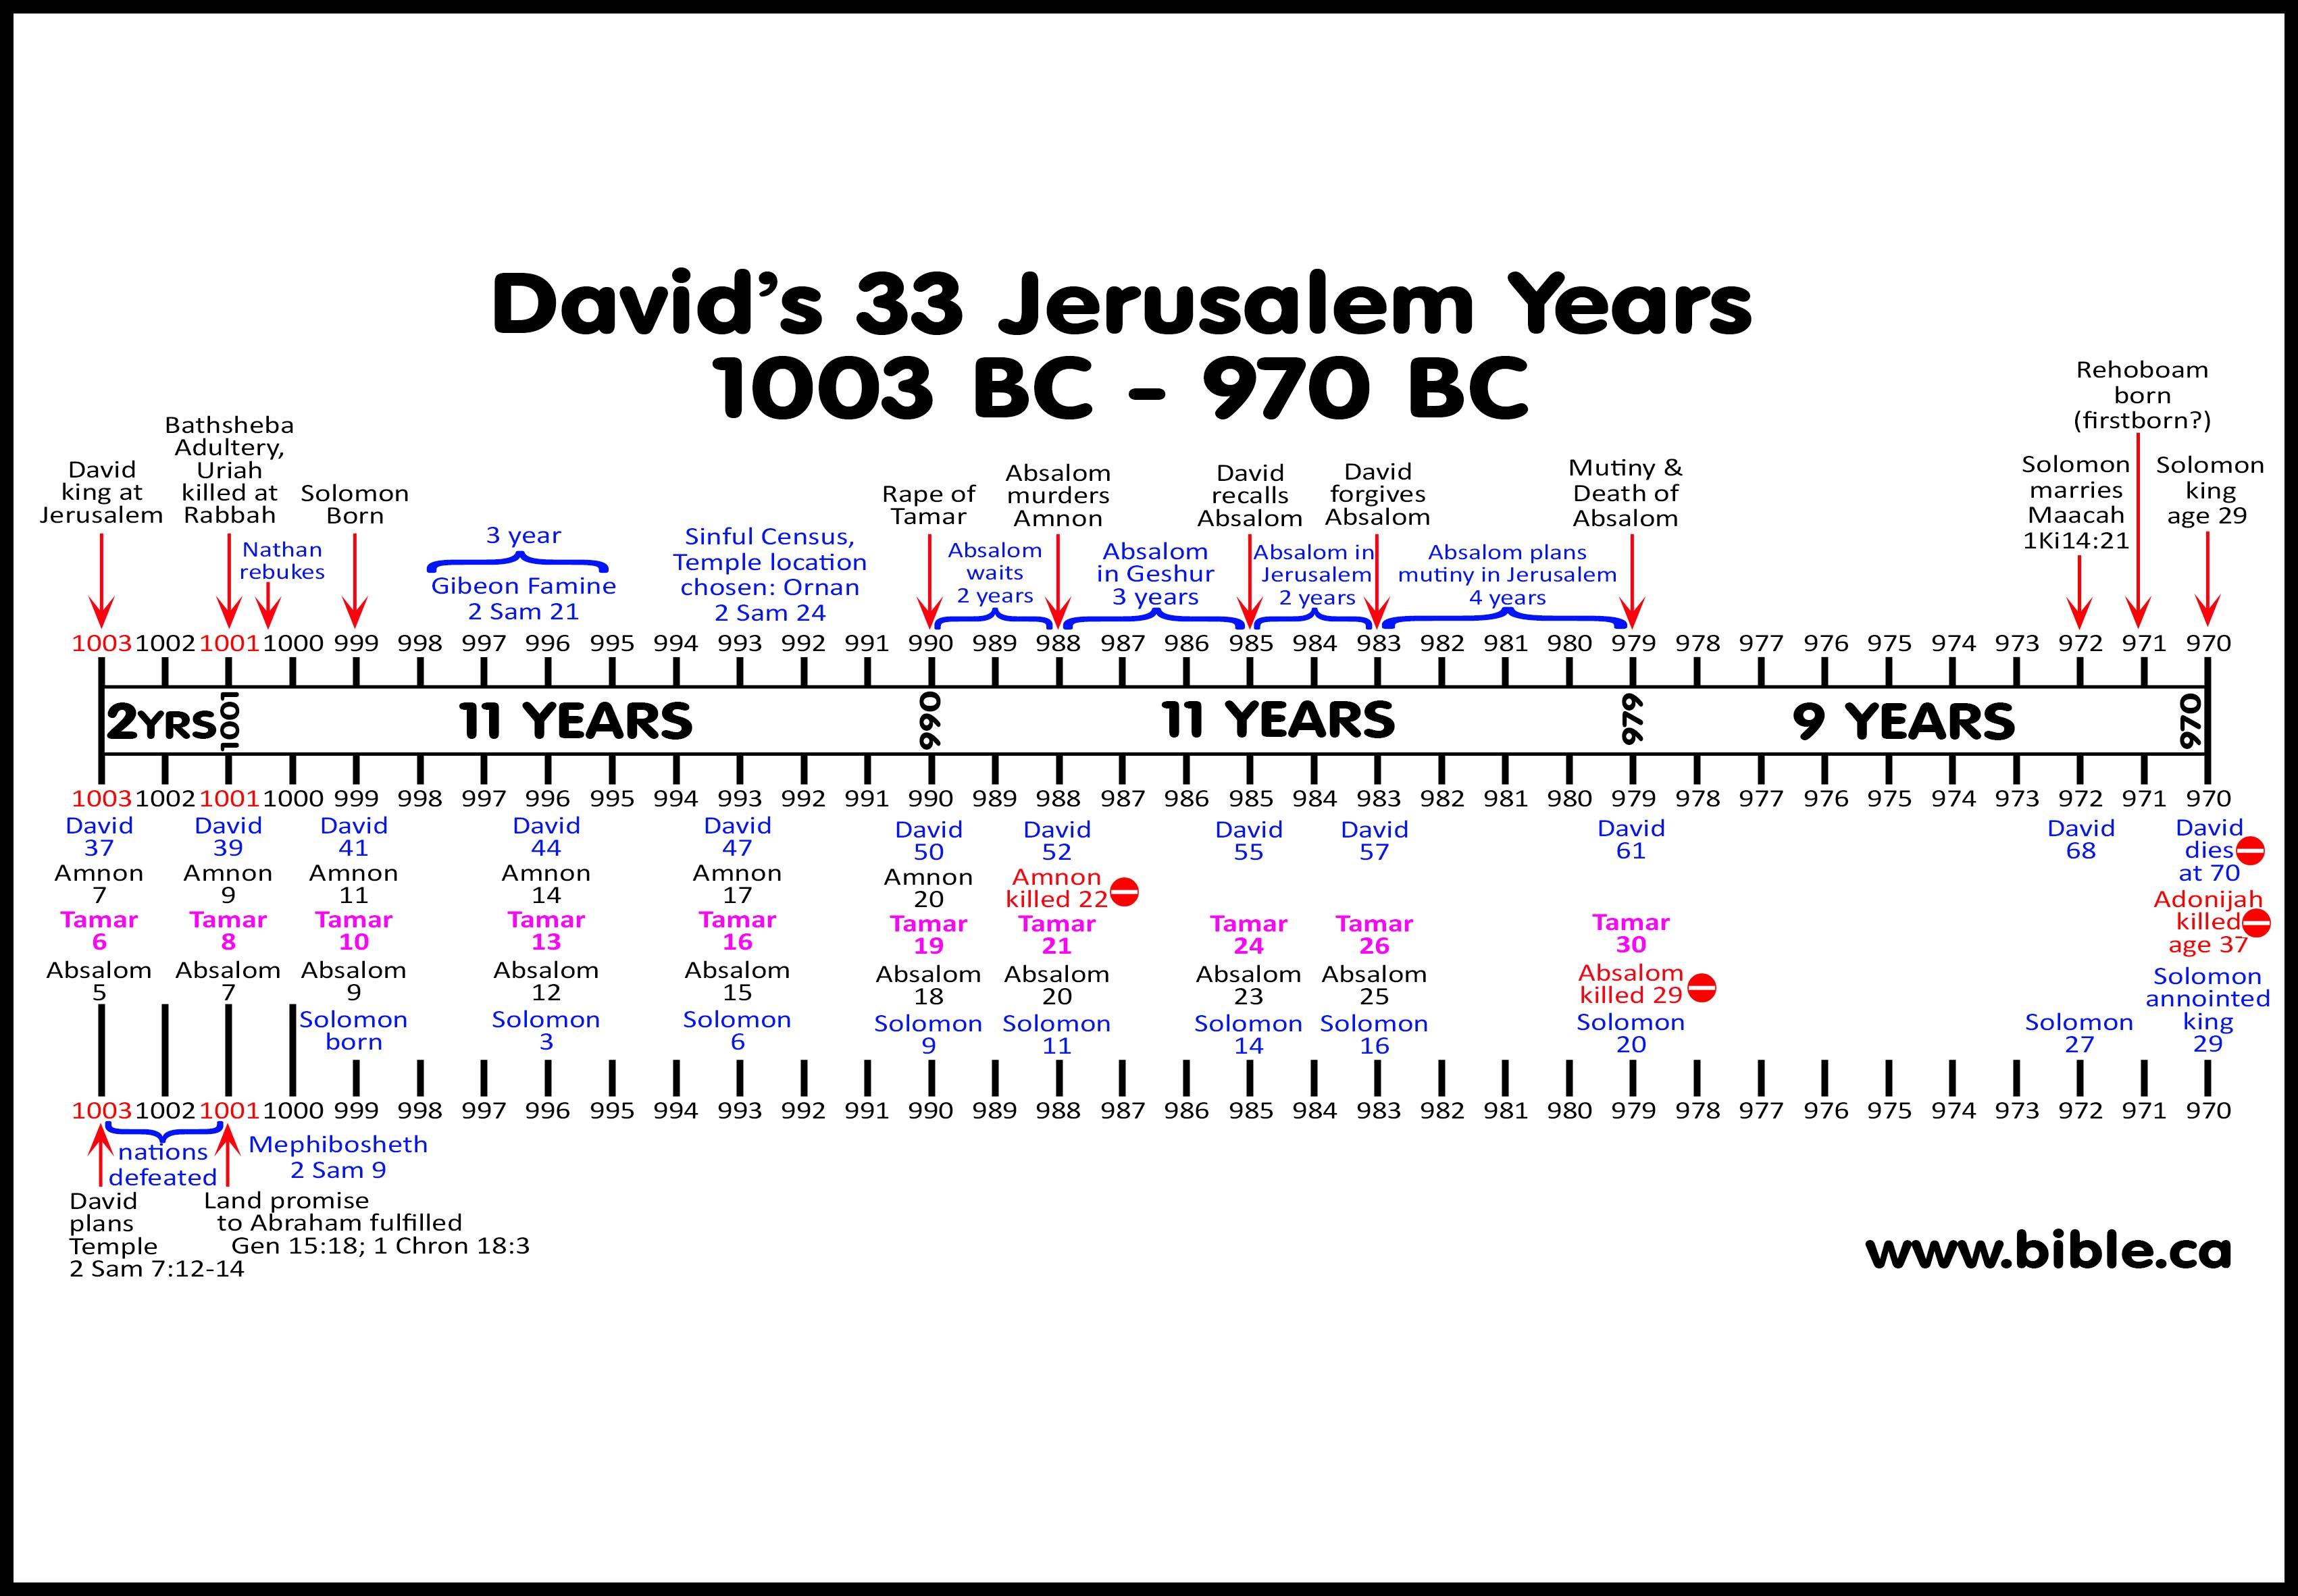 Absalom S Insurrection Of Tamar Satan Child 990